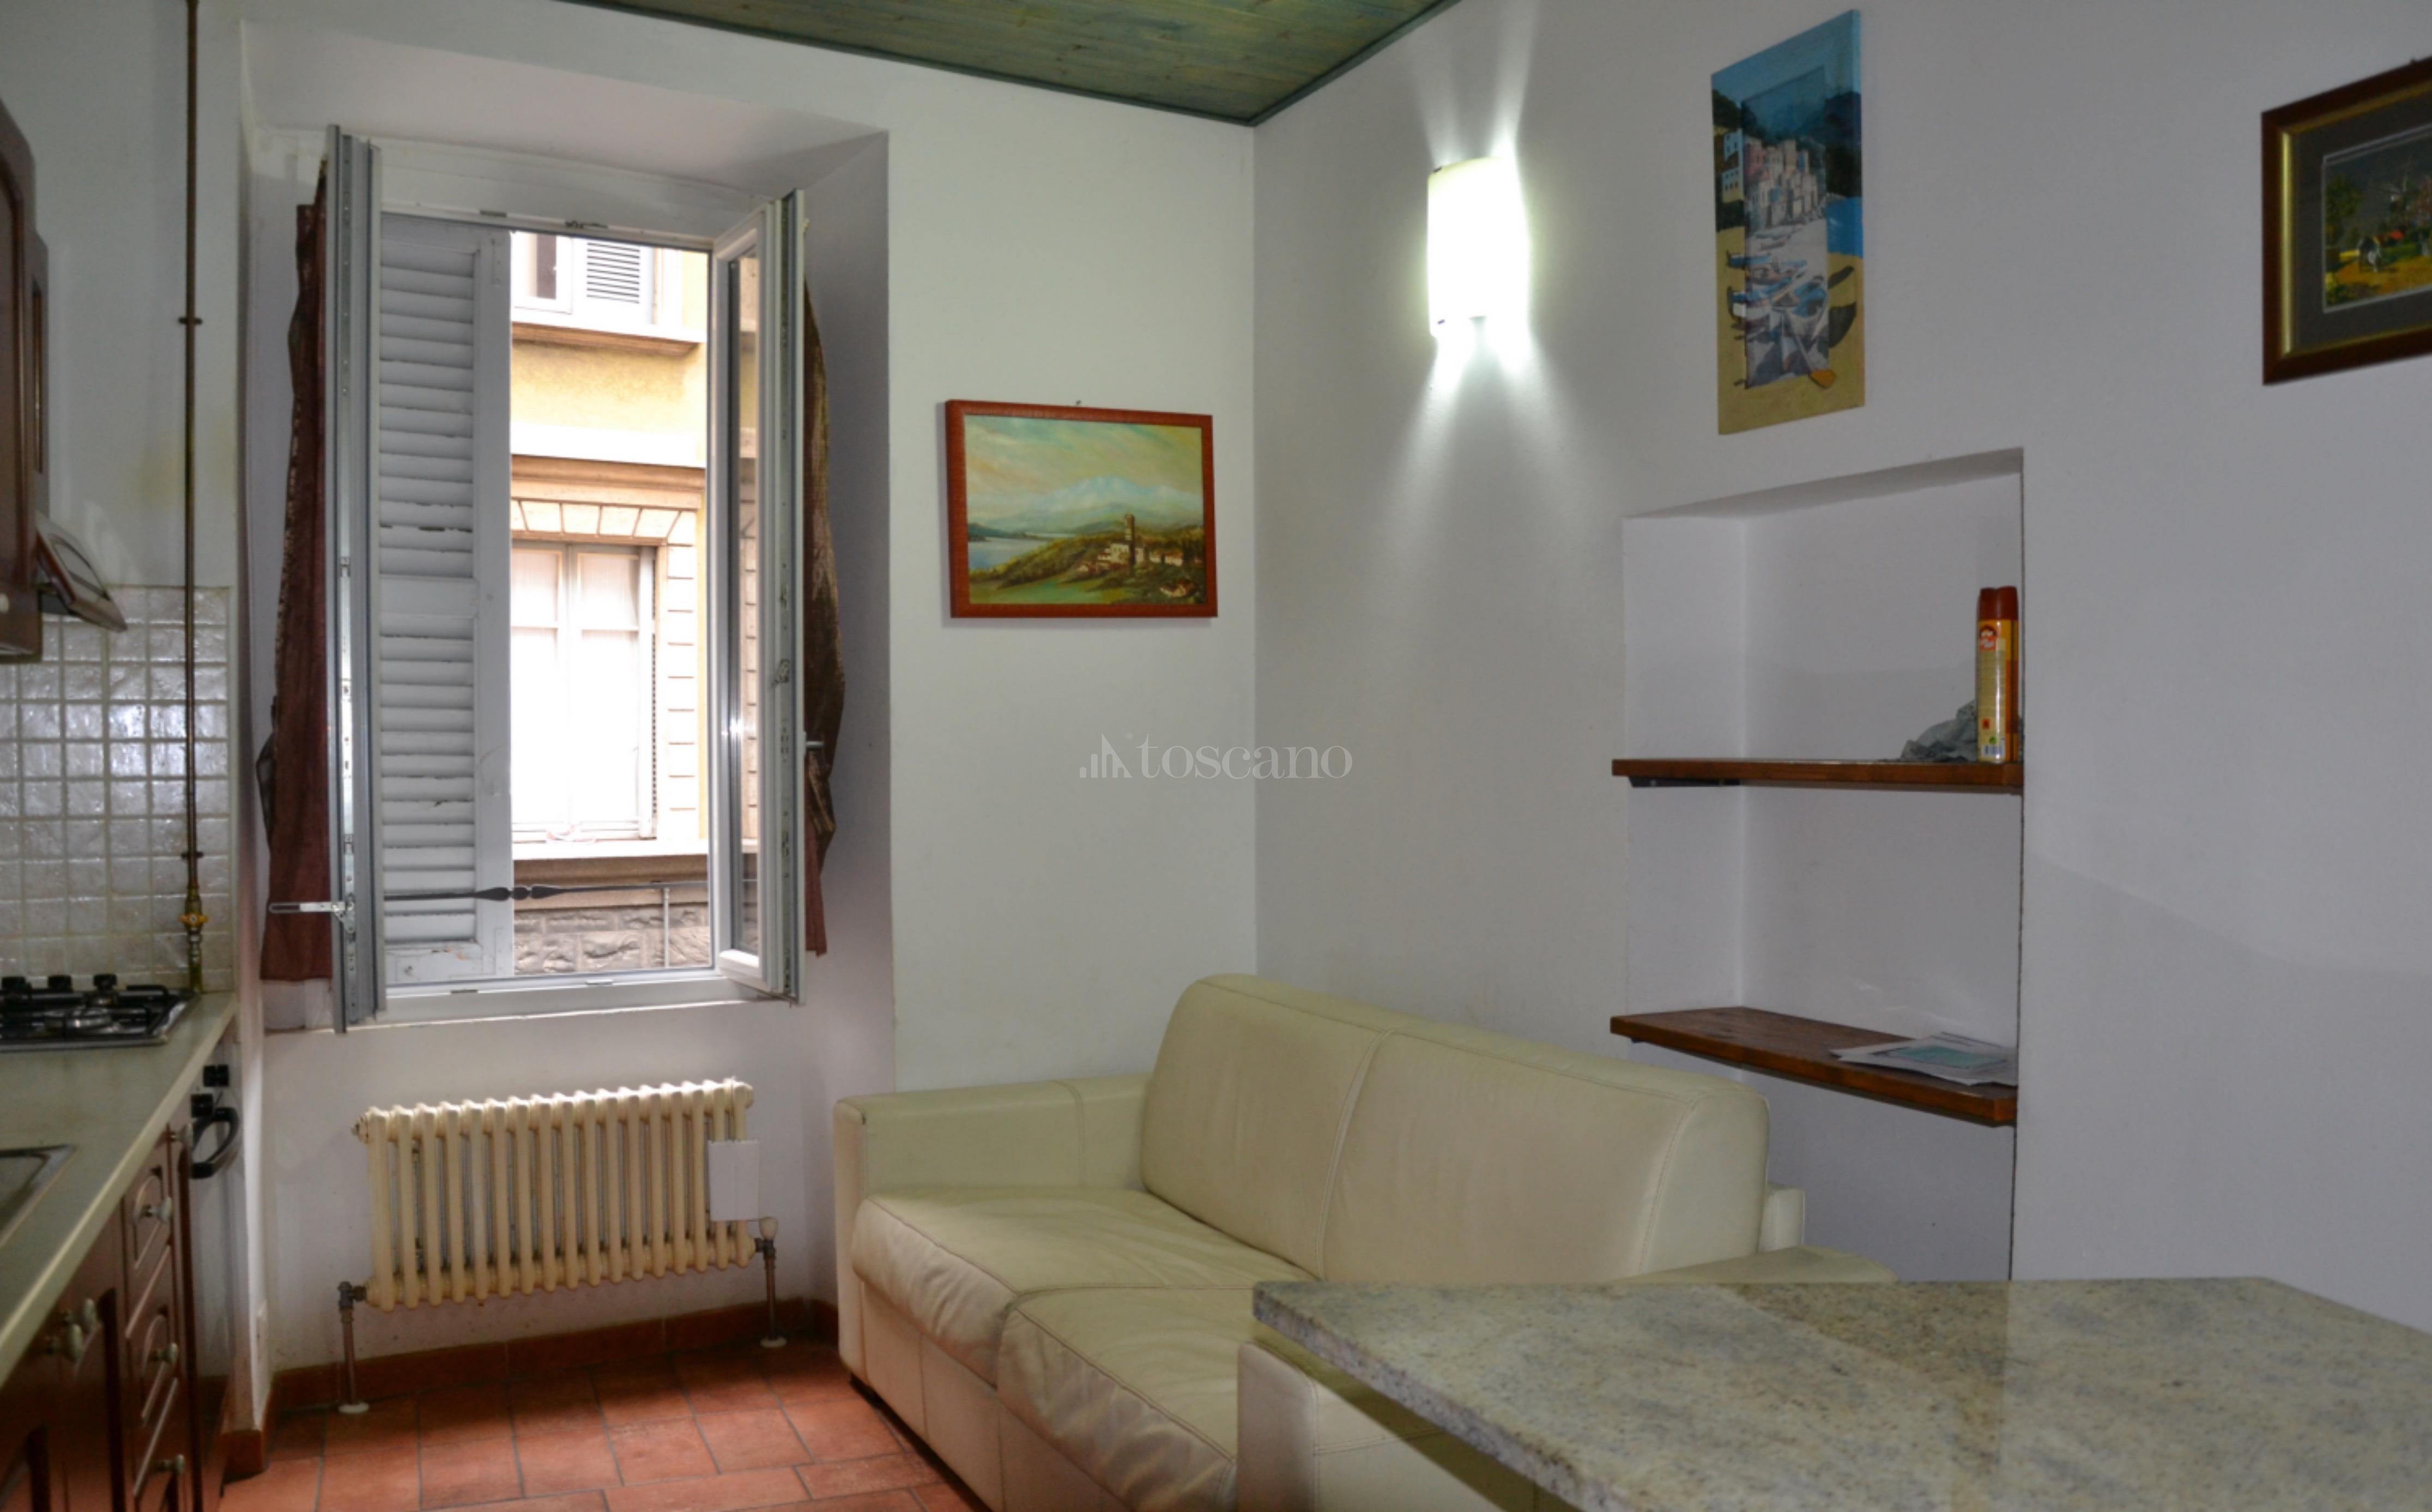 Vendita casa a como in viale lecco lecco 82 2017 toscano for Toscano immobiliare como